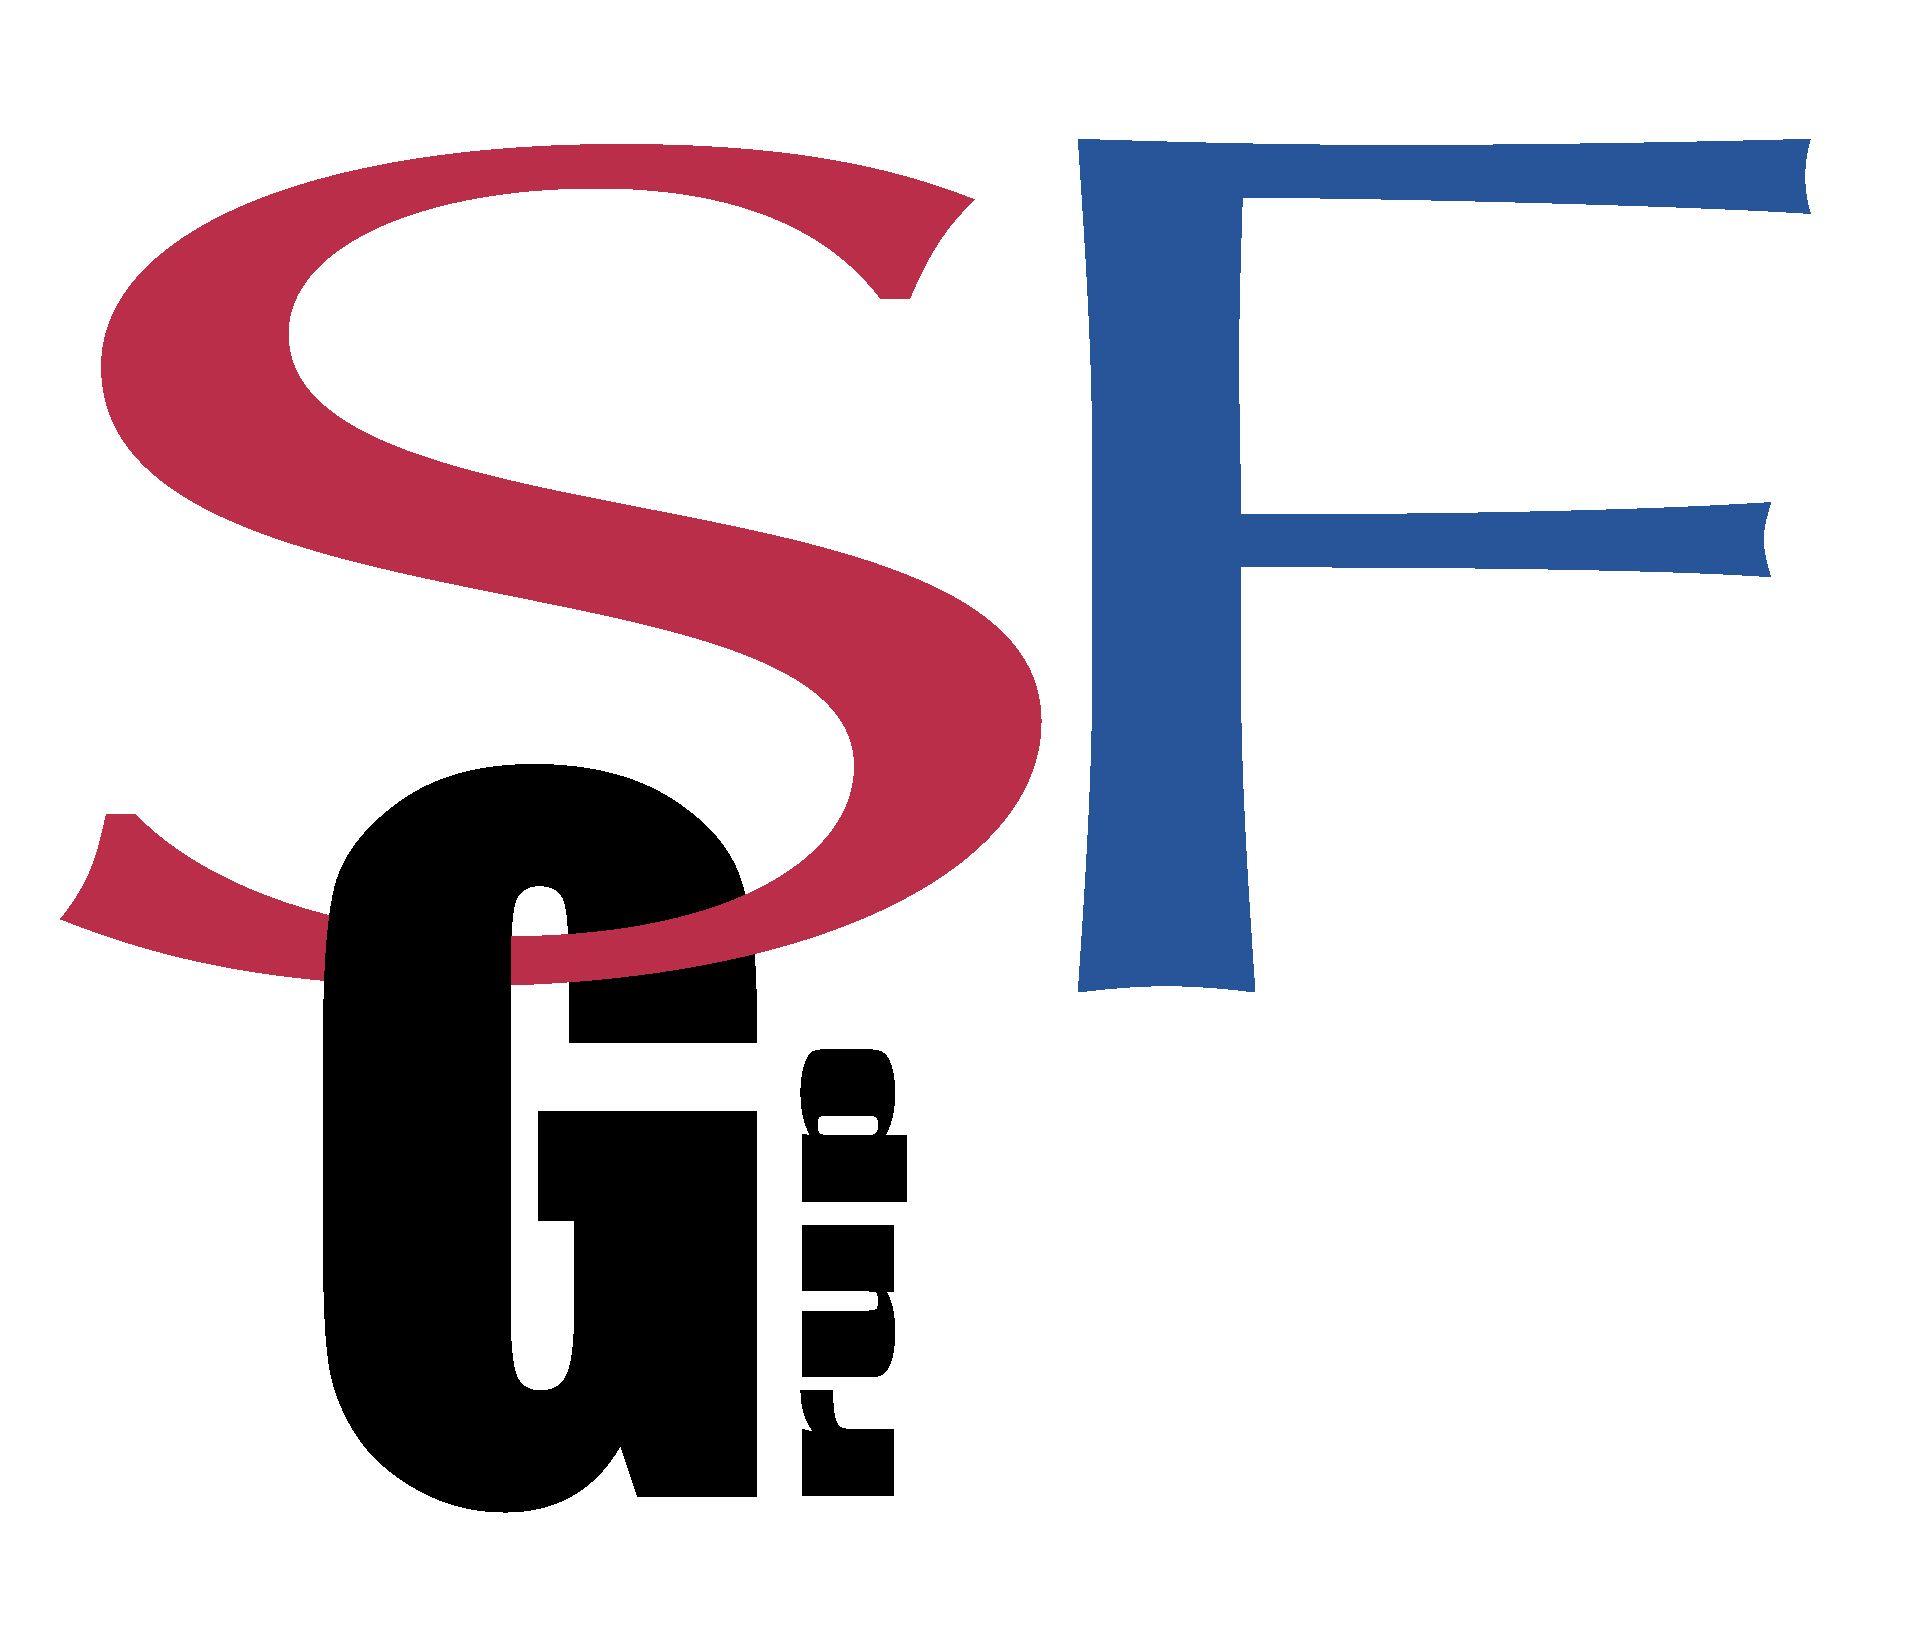 sfgrup-logo.jpg